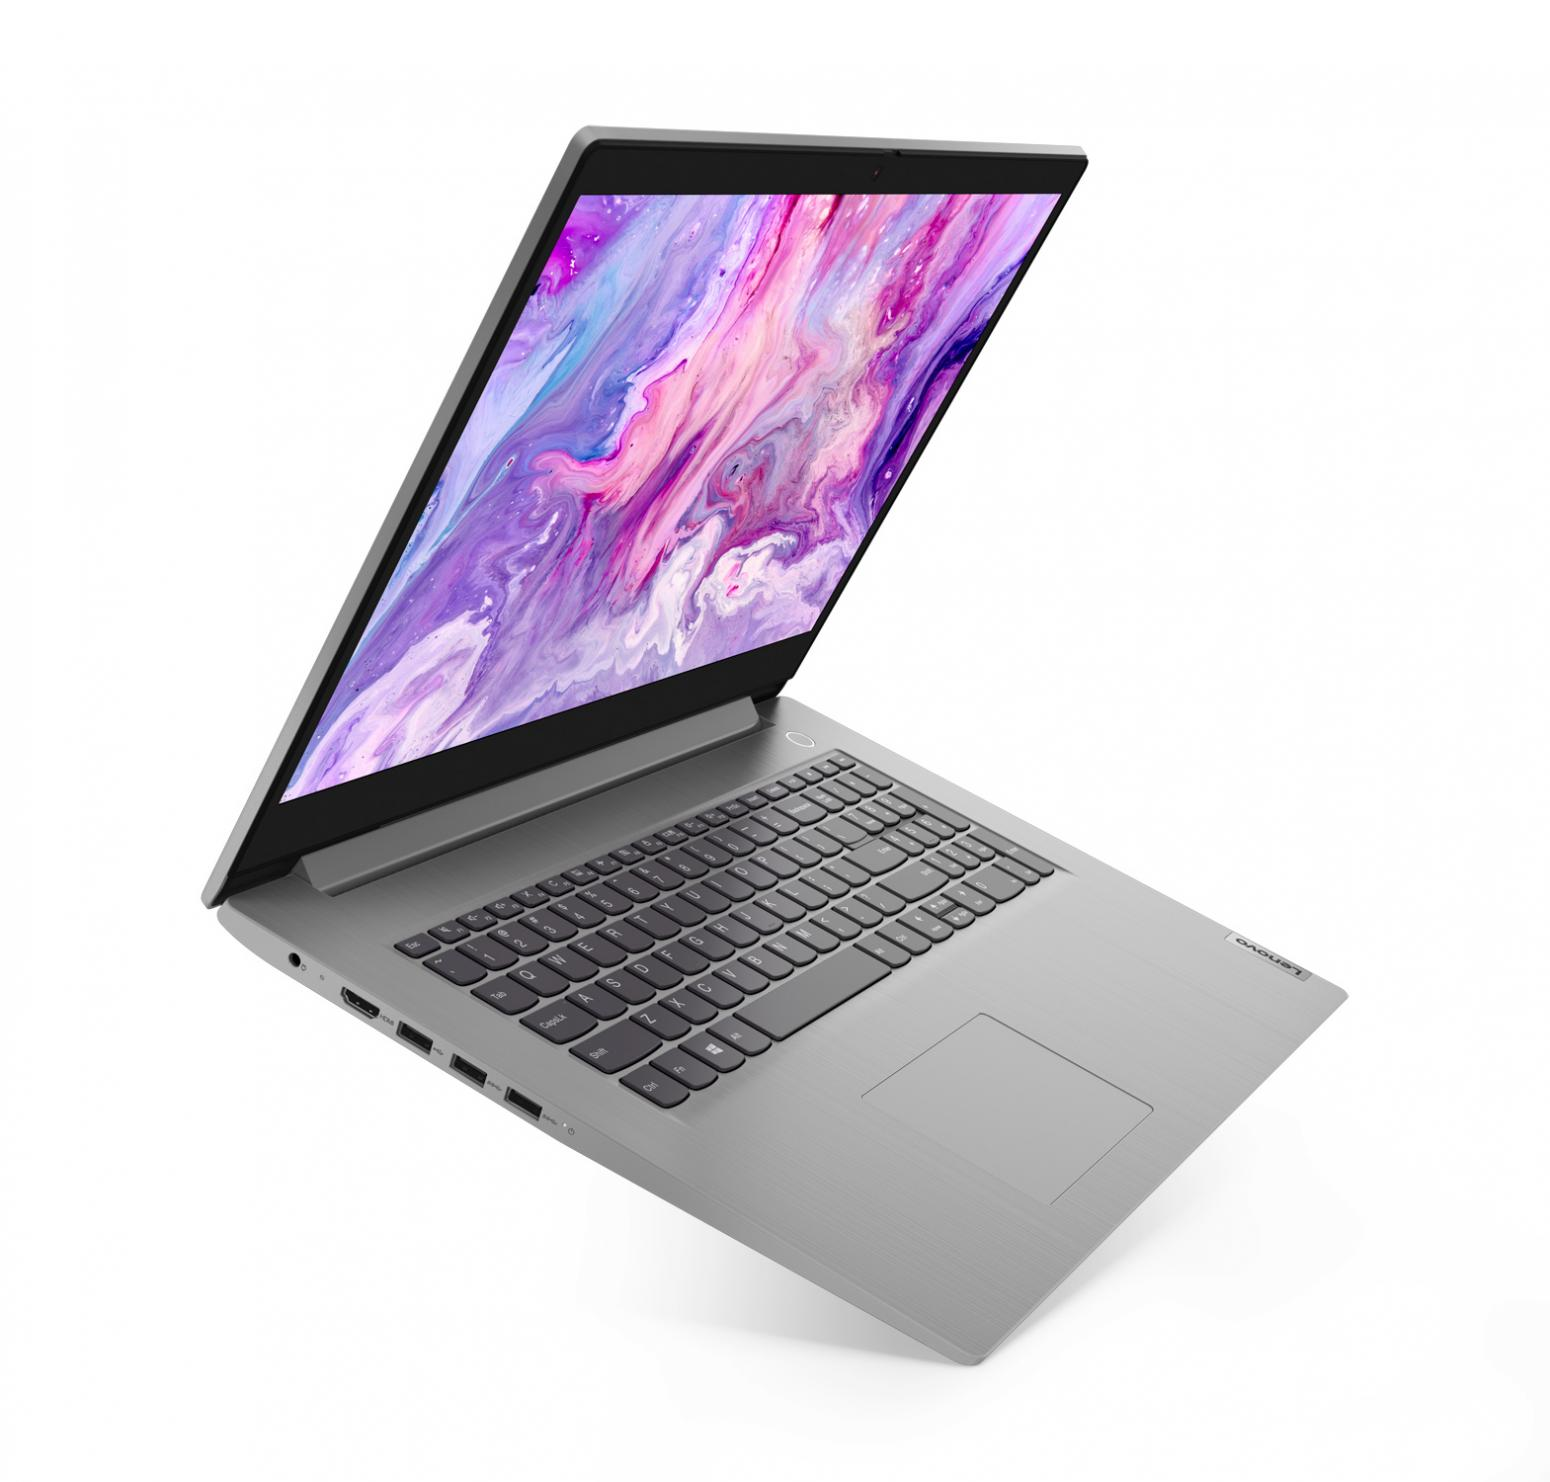 Ordinateur portable Lenovo IdeaPad 3 17ADA05-931 (81W2000UFR) Argent - photo 2